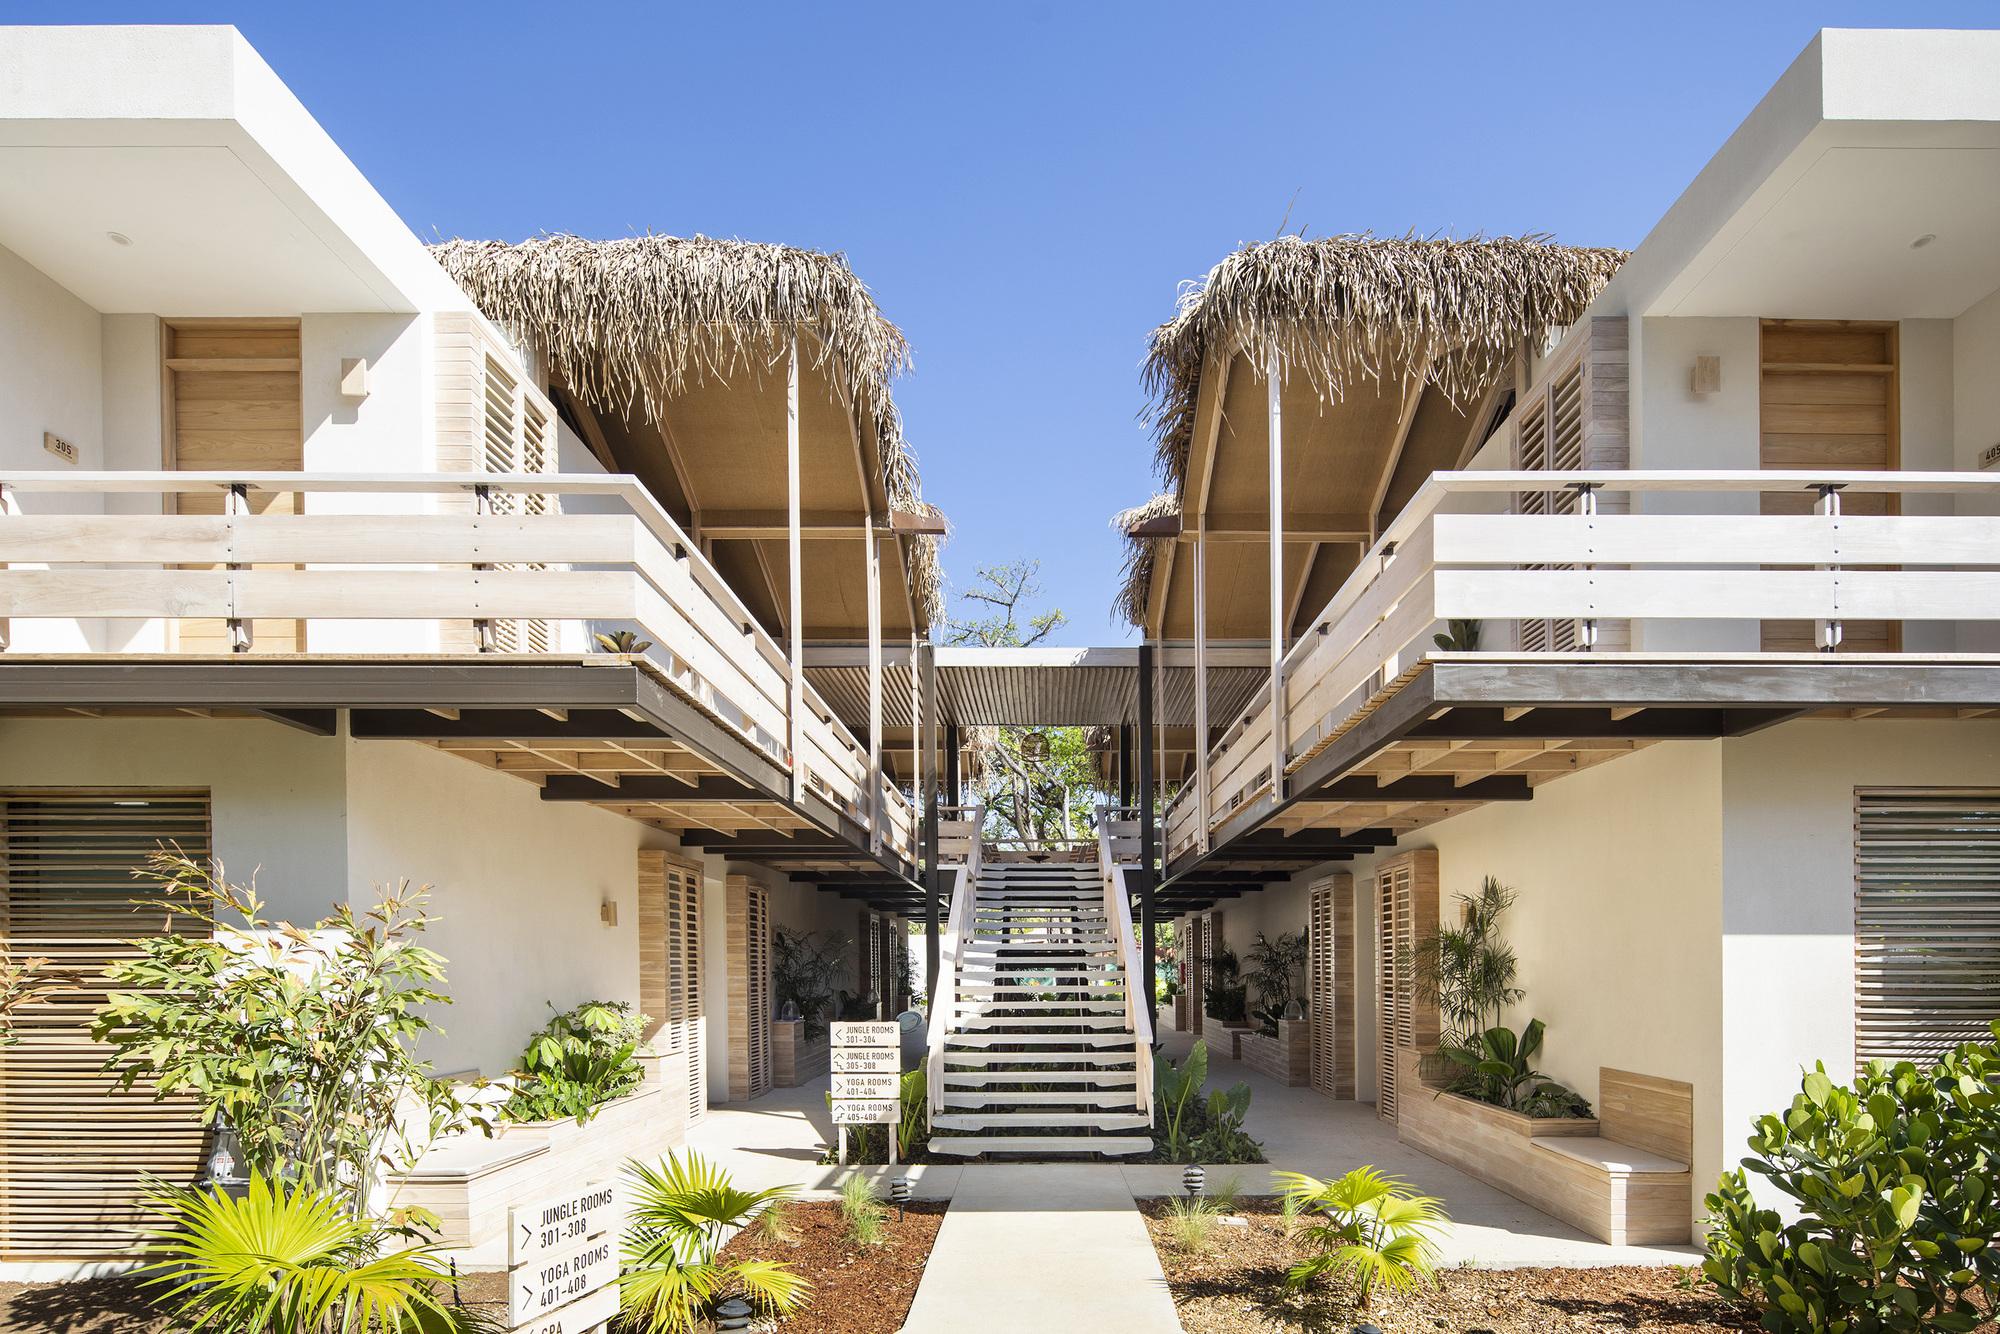 The Gilded Iguana Hotel / Studio Saxe